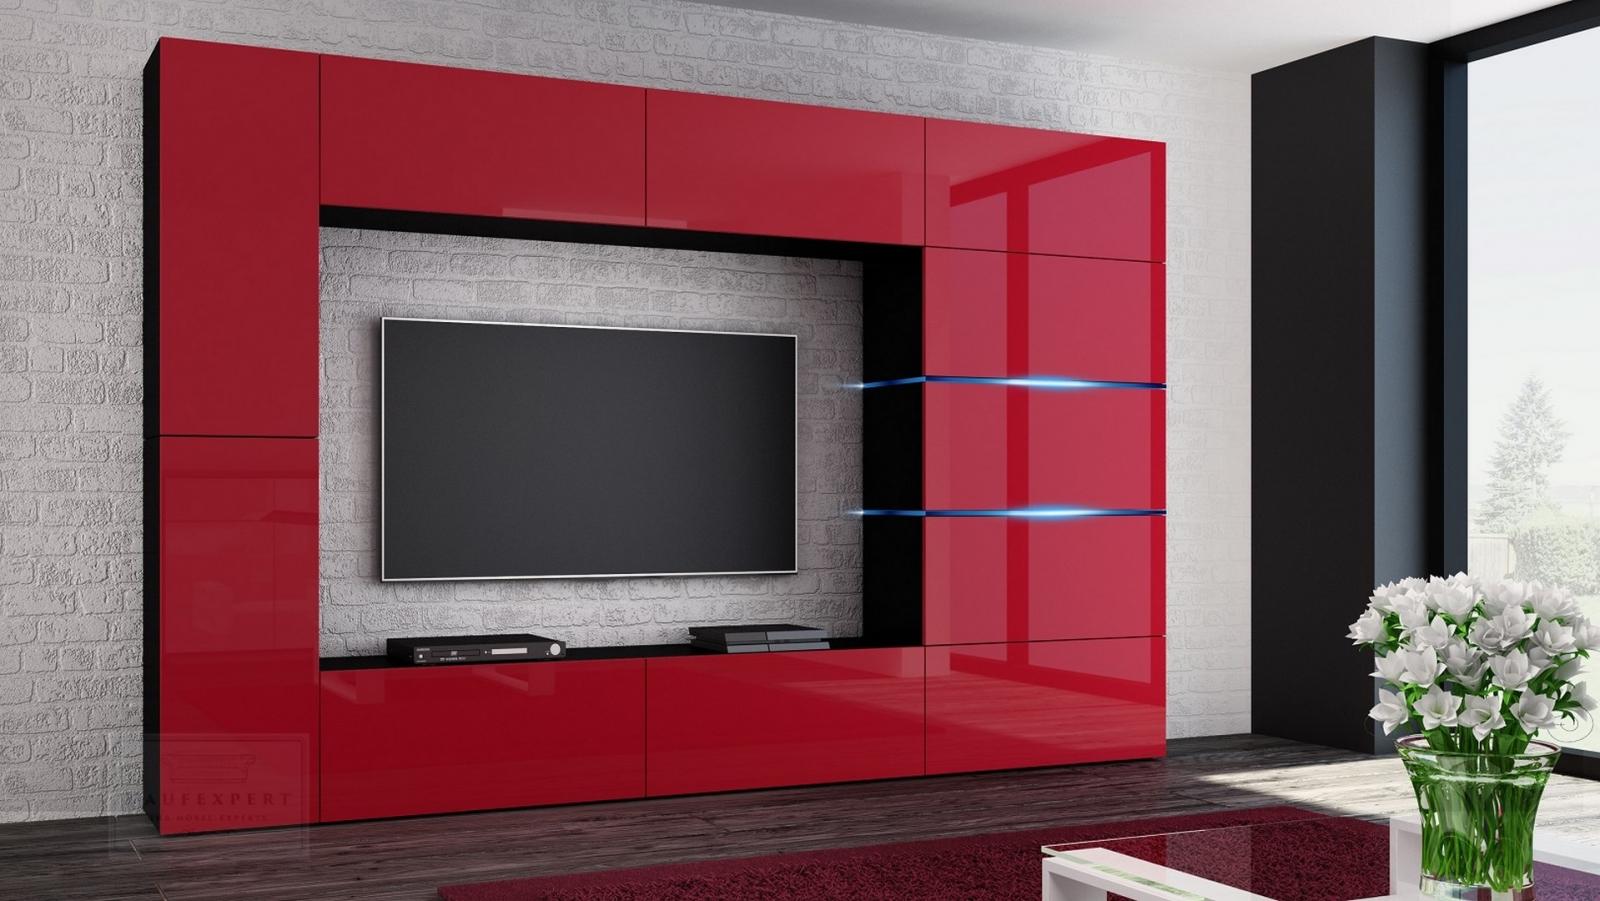 Kaufexpert wohnwand shadow rot hochglanz schwarz 285 cm - Anbauwand modern ...